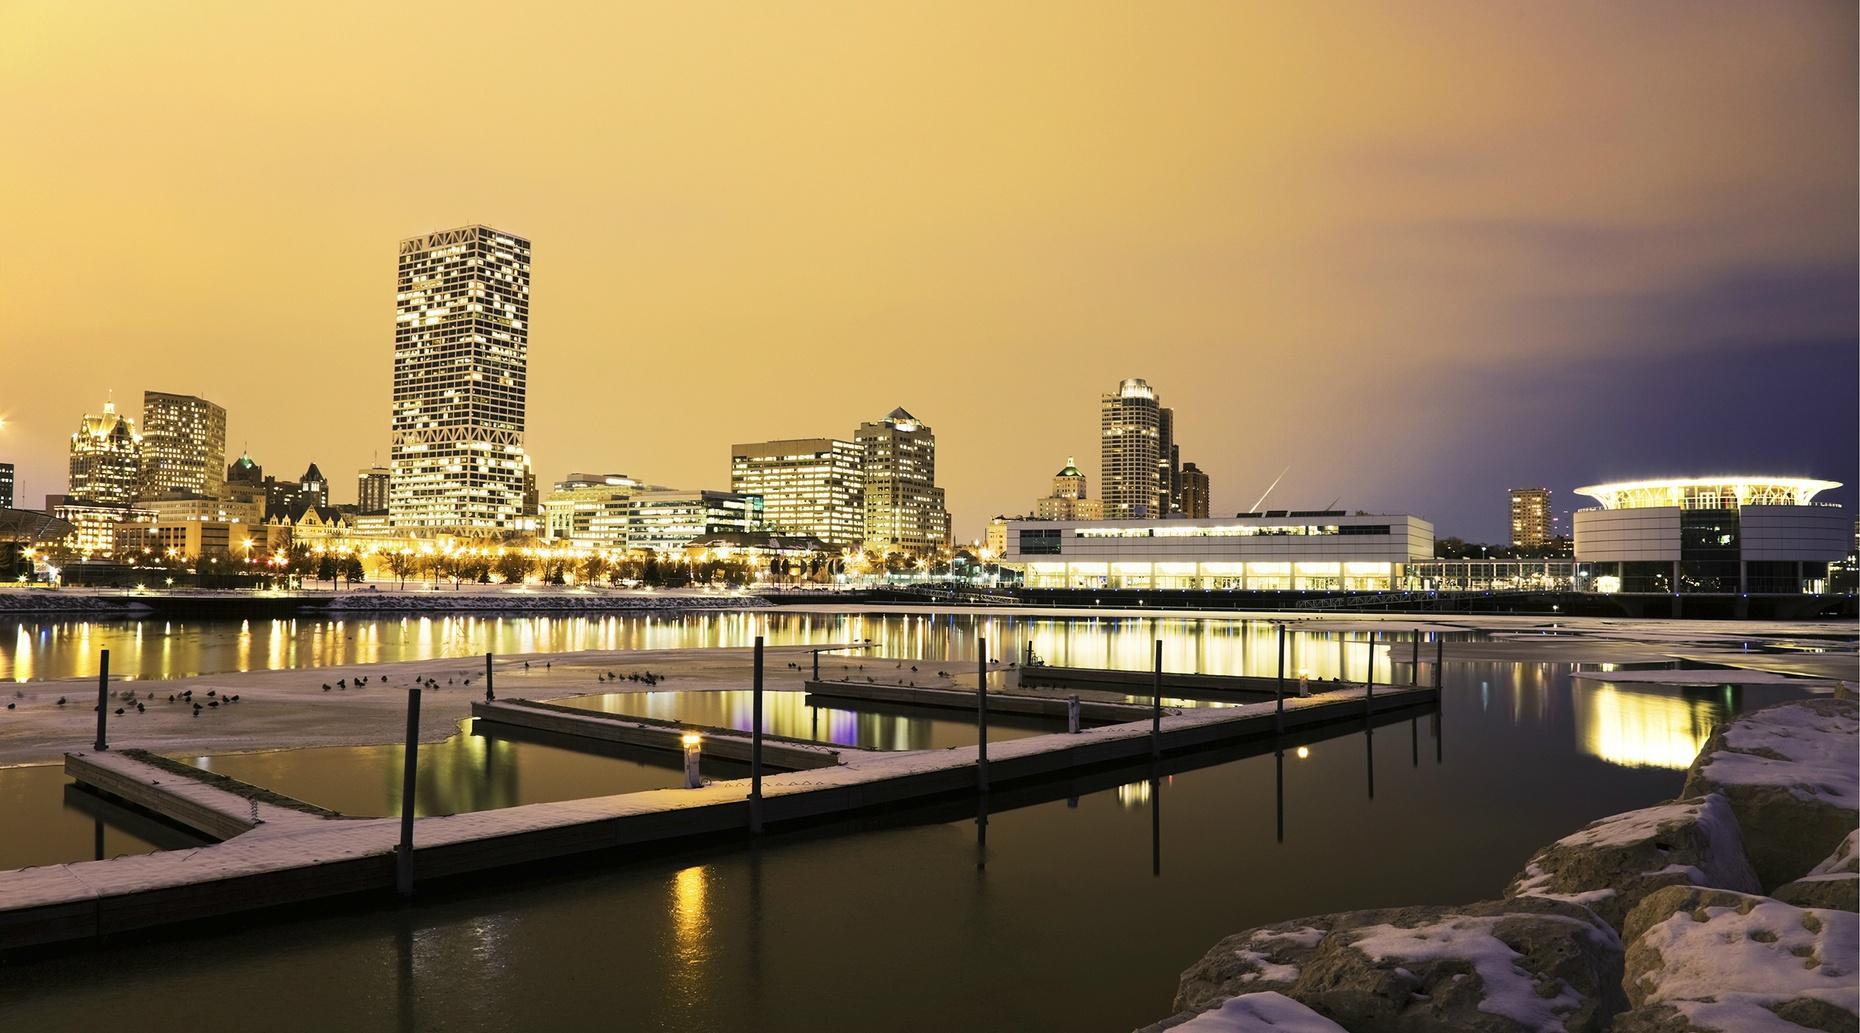 Guided Milwaukee Skywalk Tour